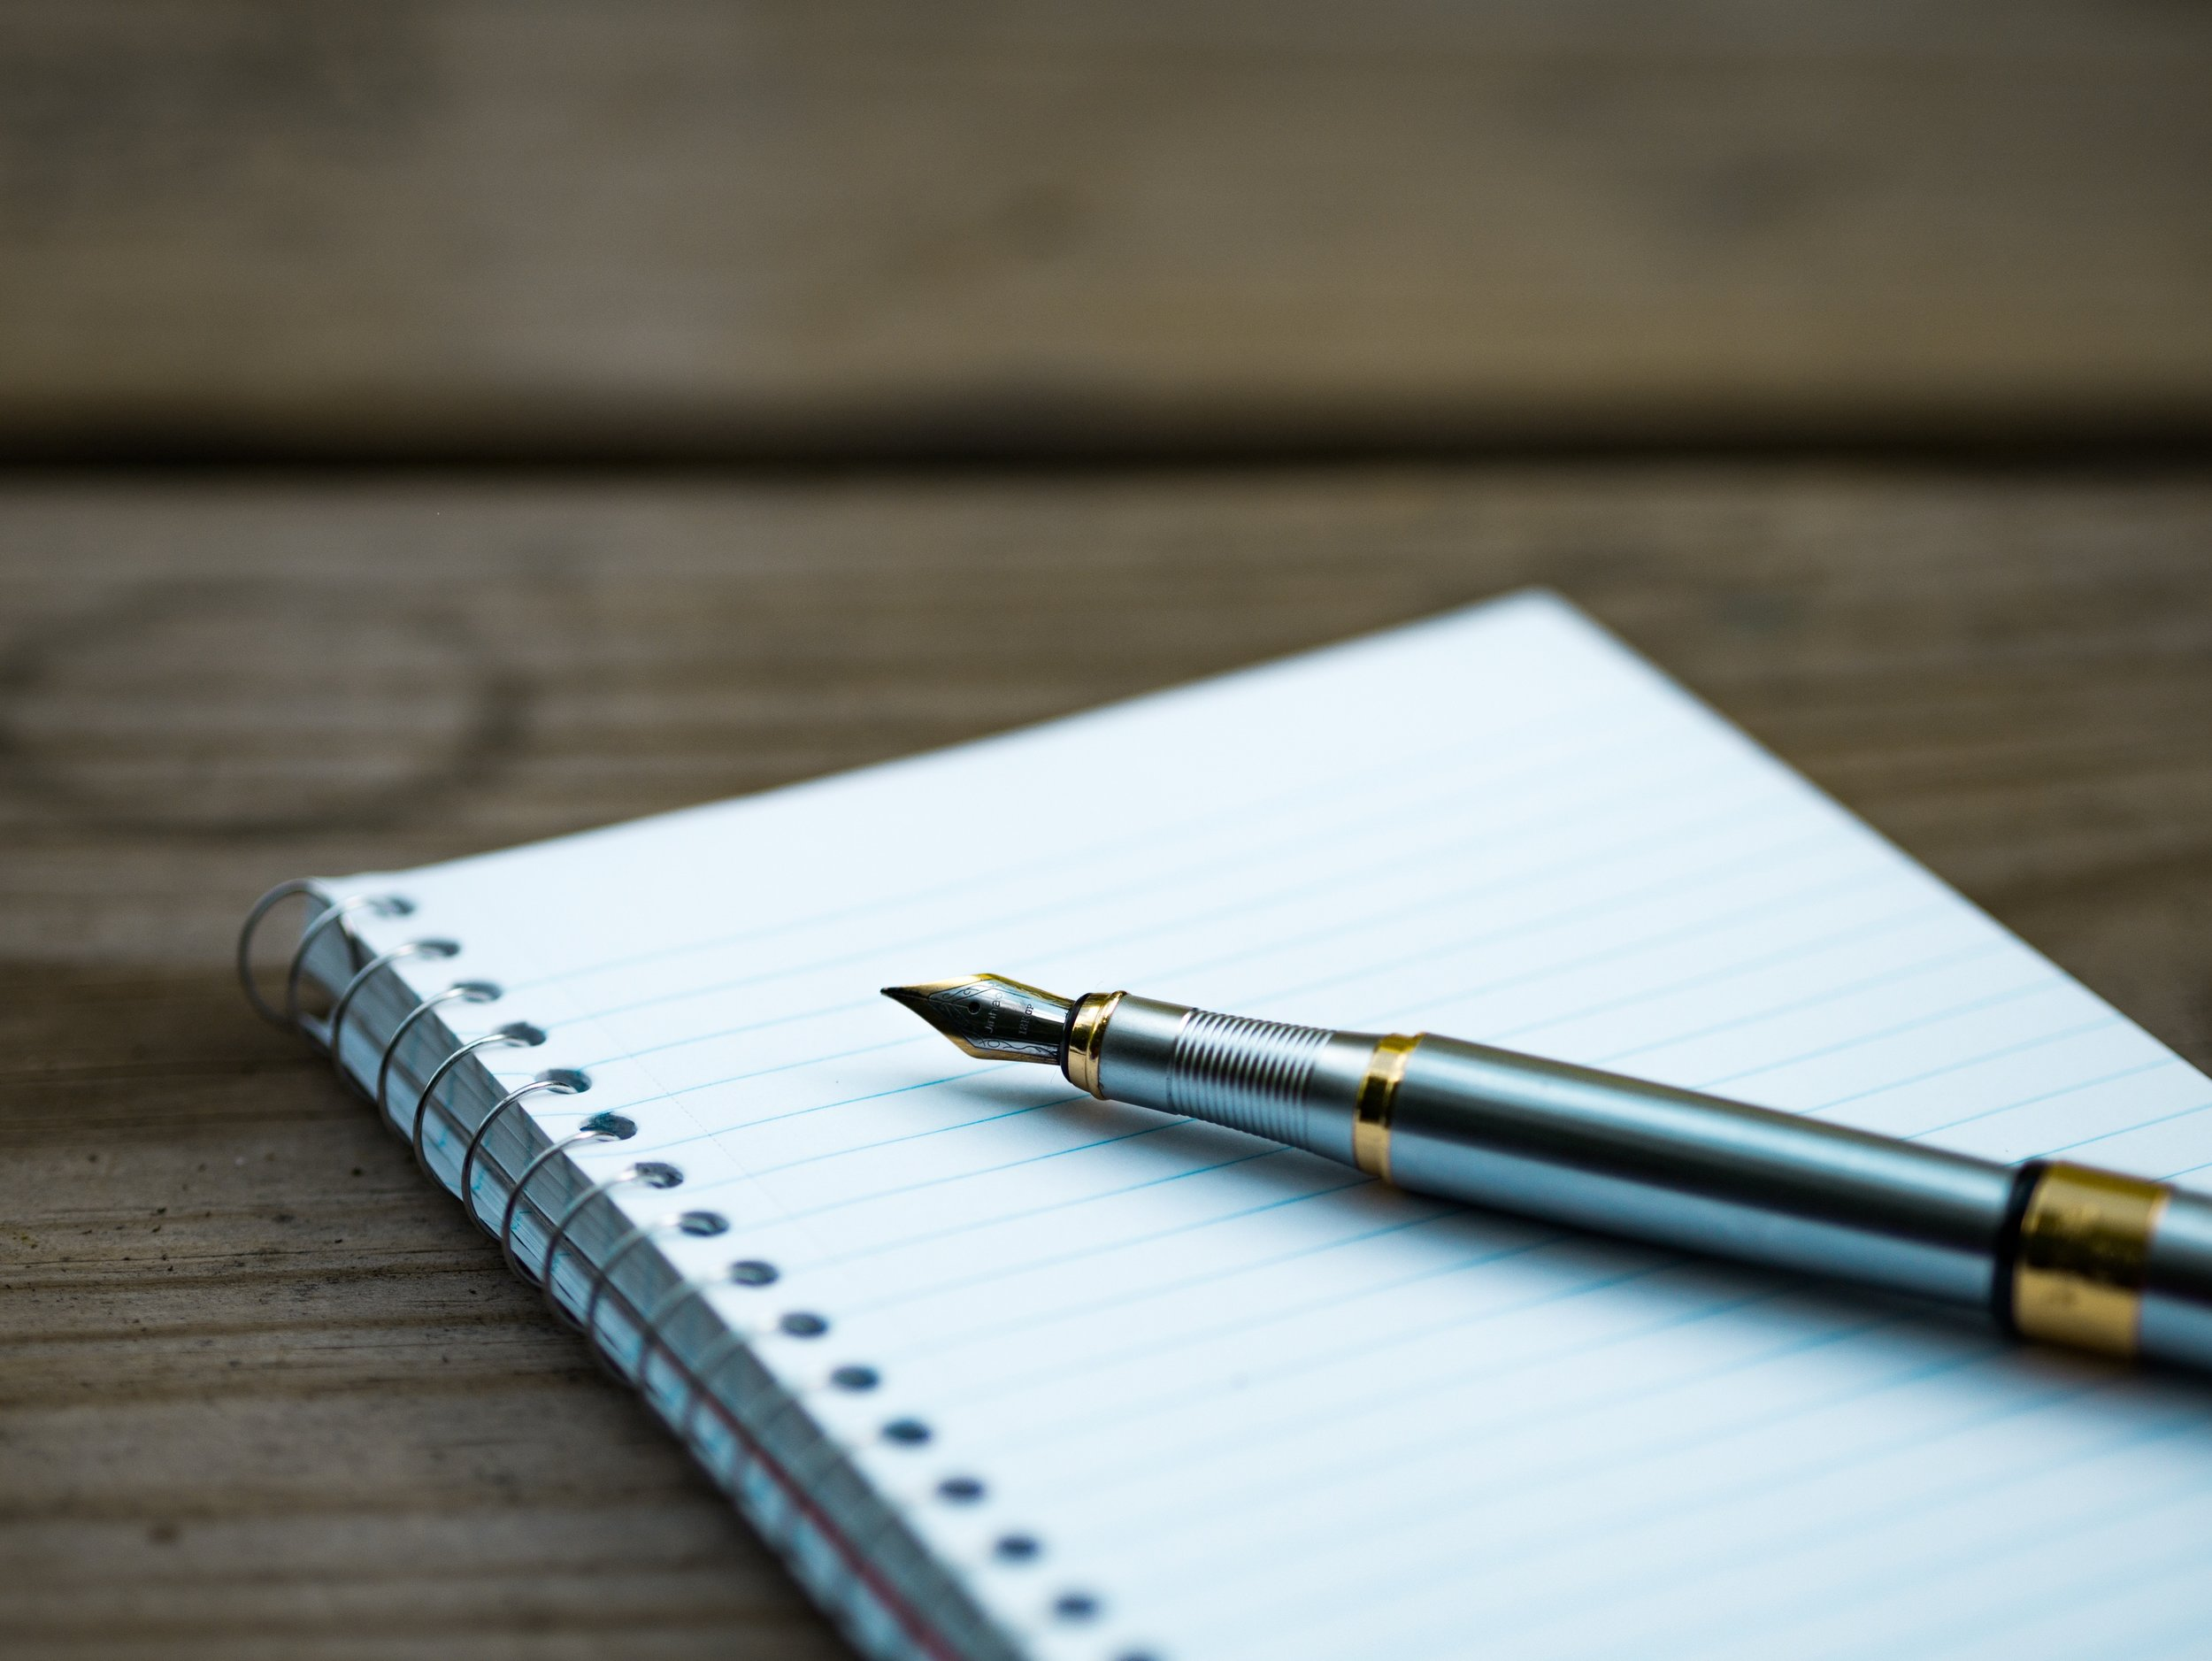 Notebook_with_pen.jpg